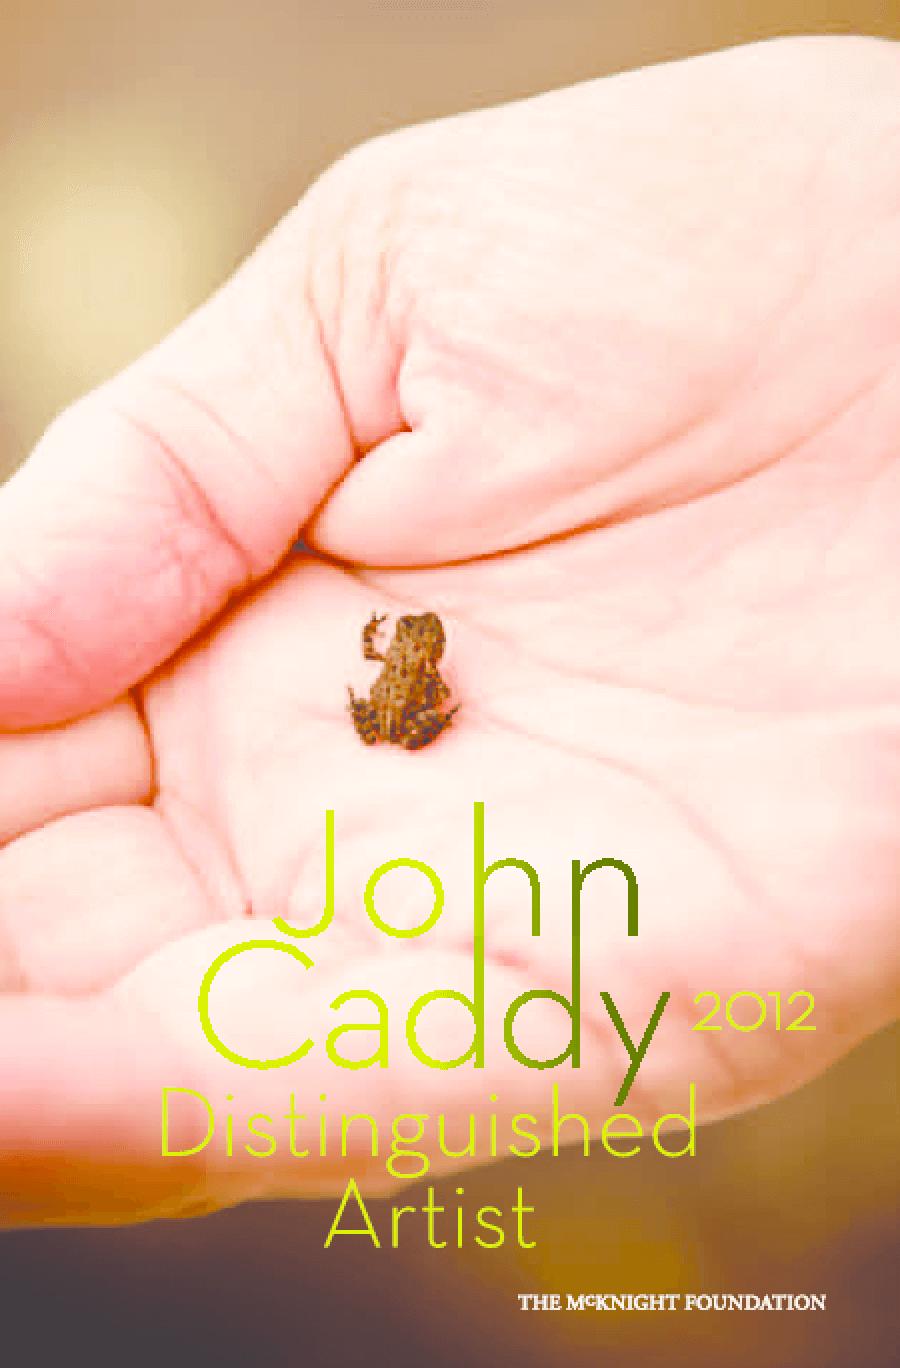 John Caddy: 2012 Distinguished Artist